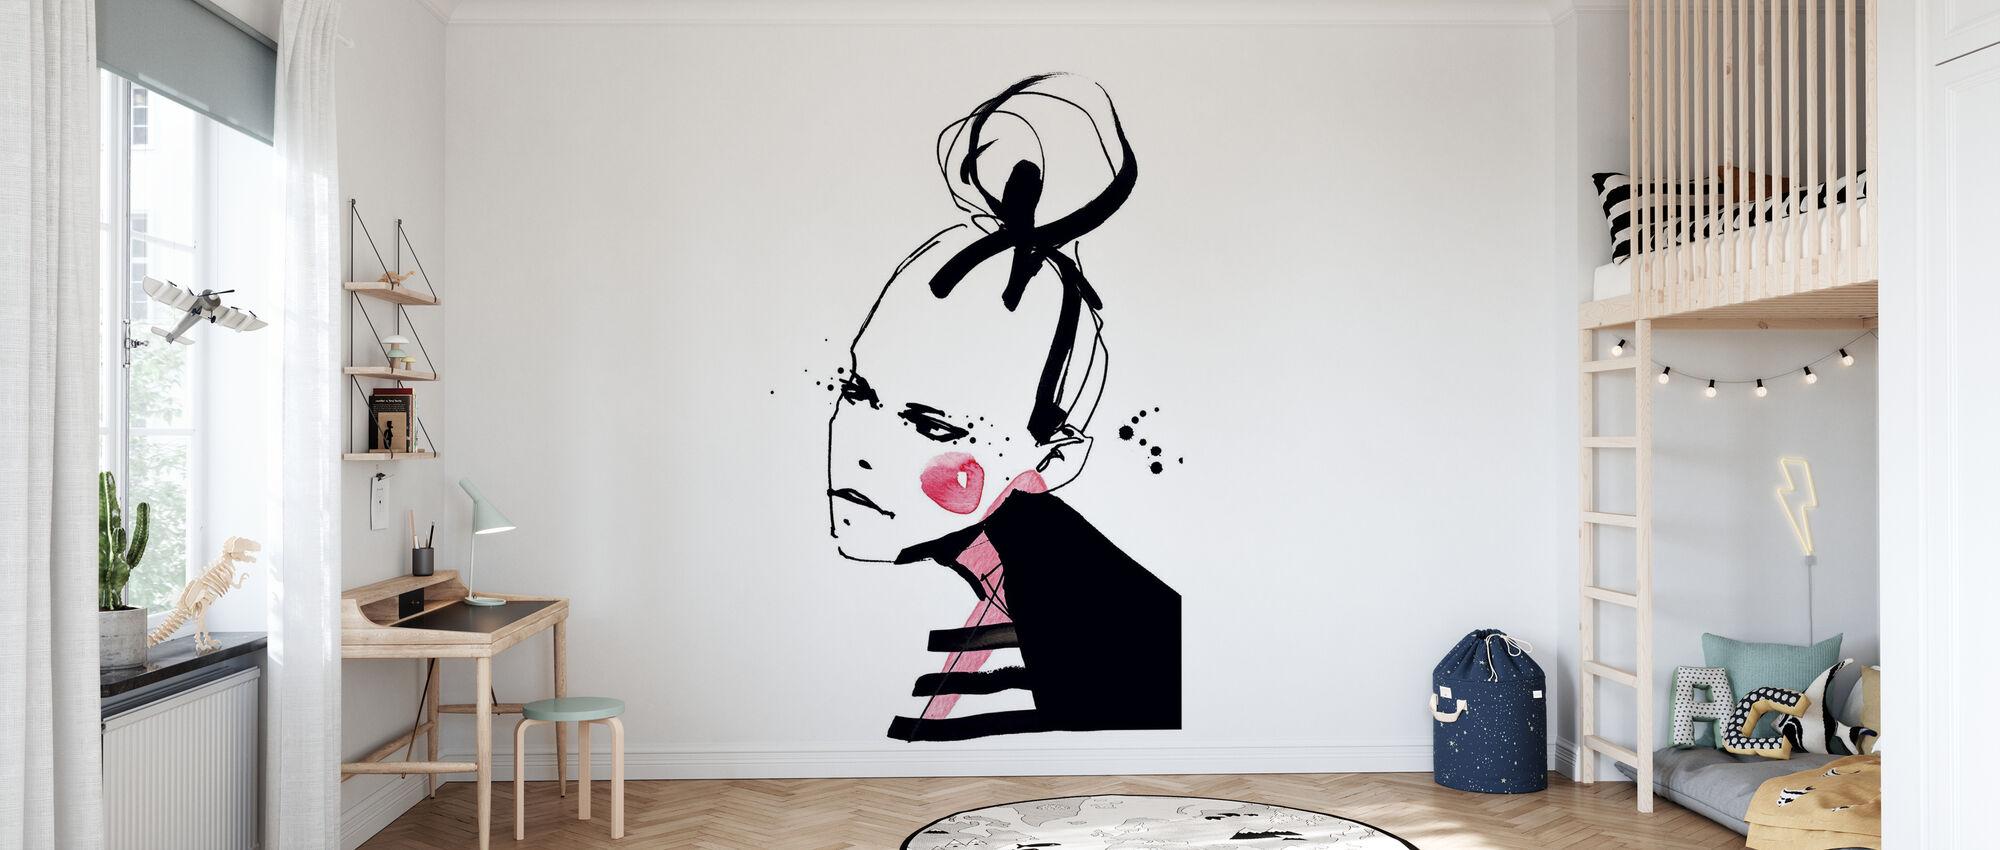 Rouge Girl - Wallpaper - Kids Room